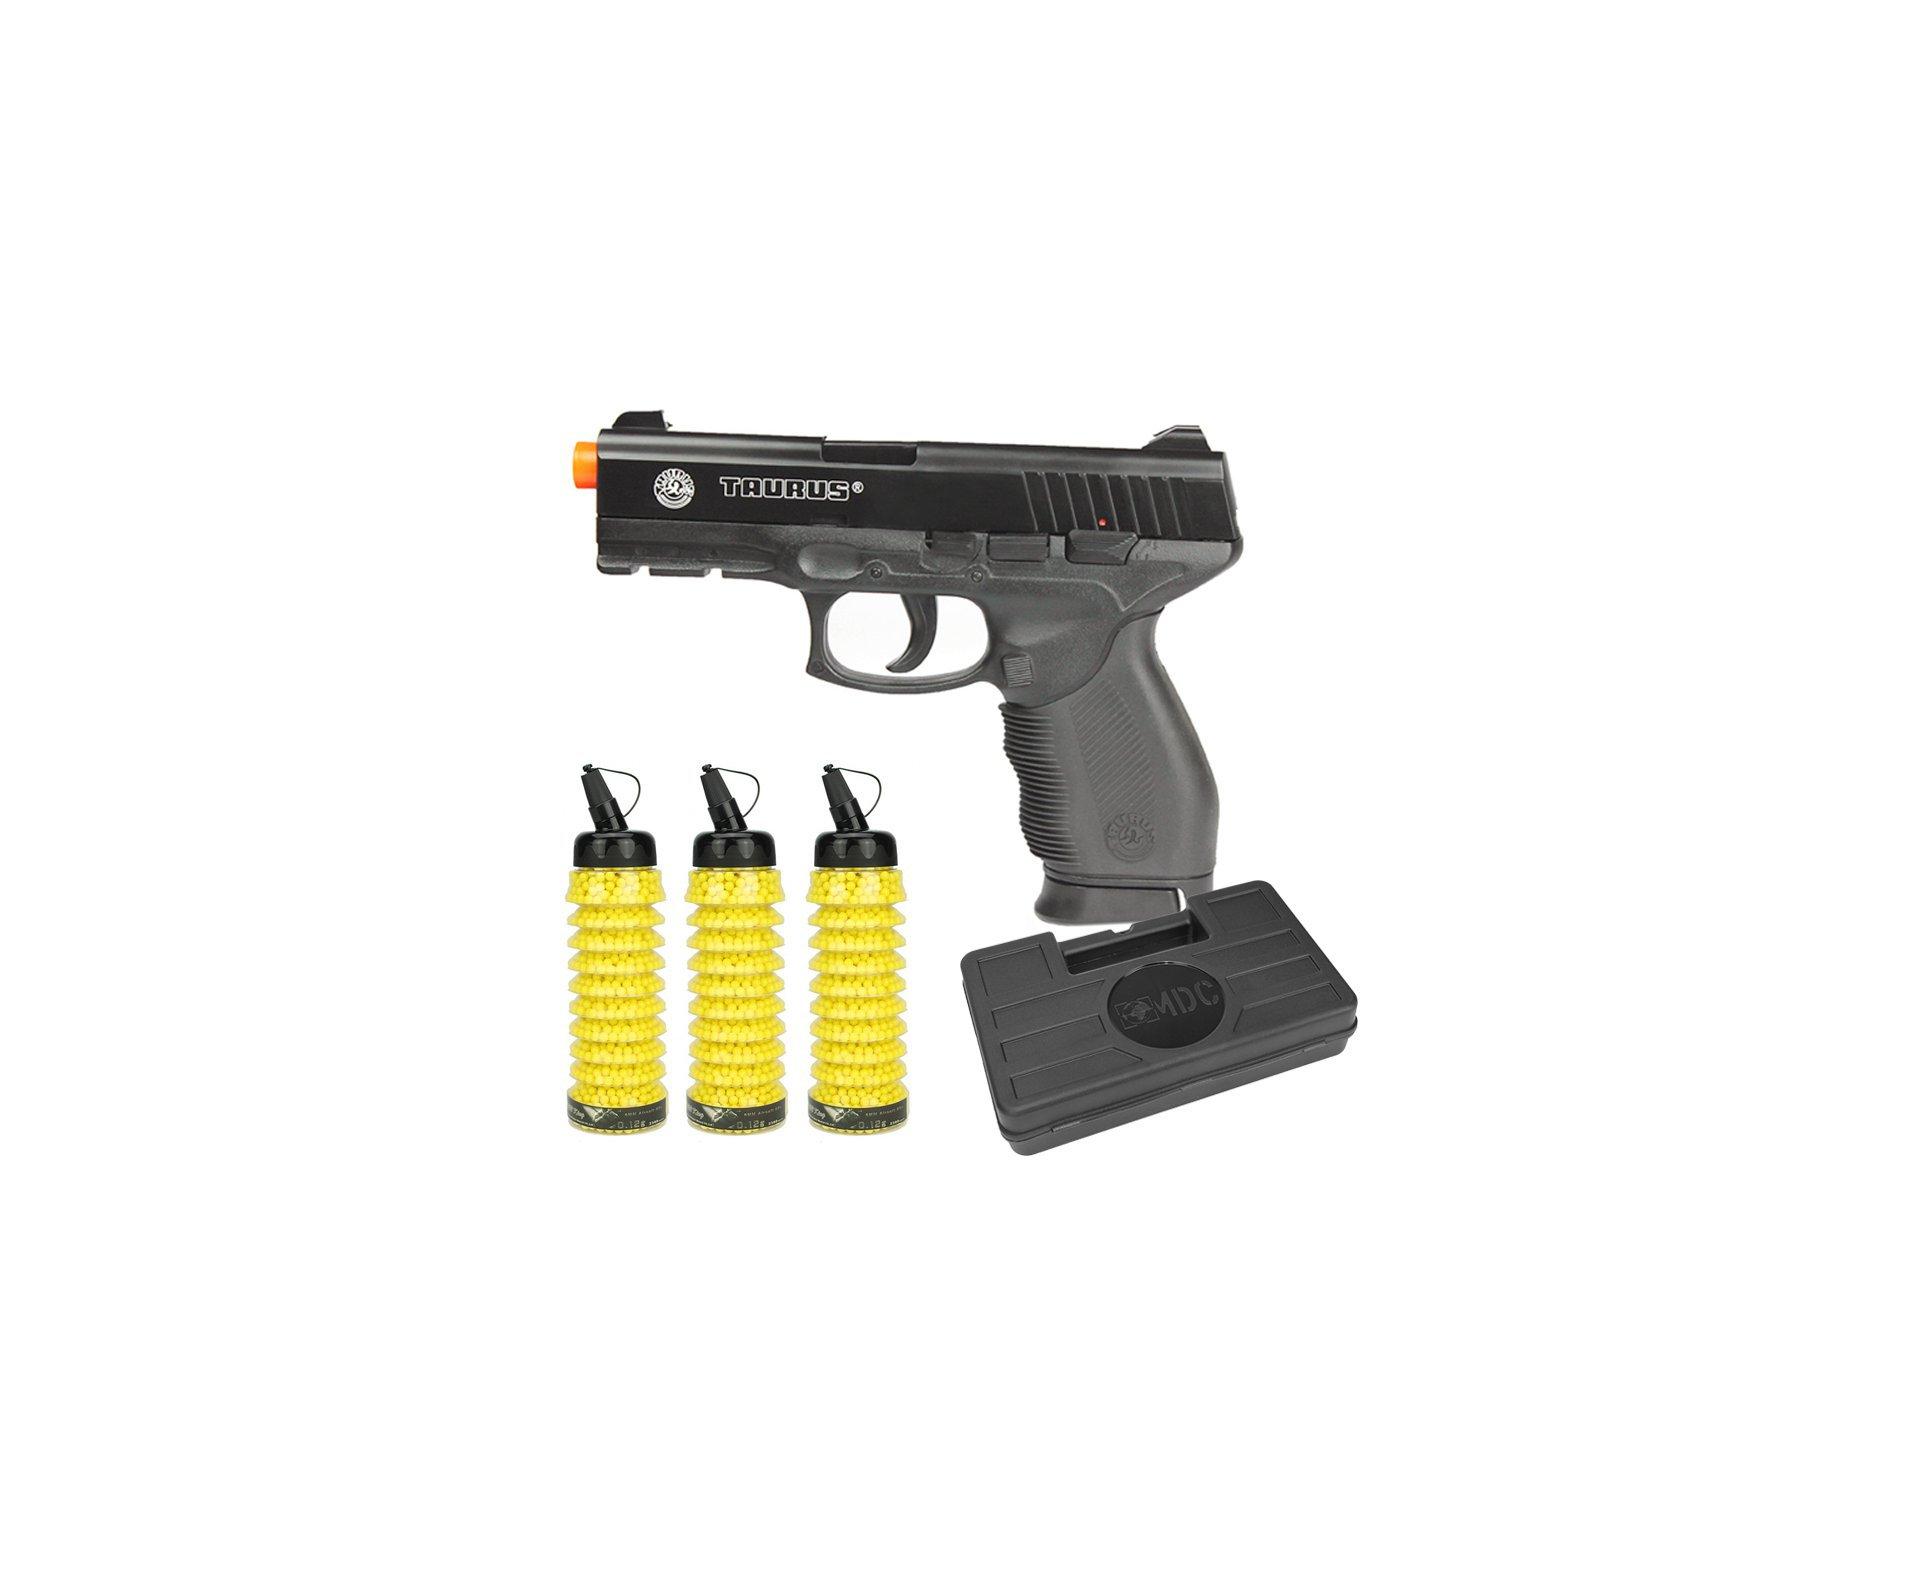 Pistola De Airsoft Taurus Pt 24/7 Semi/metal - Cal 6,0 Mm + 6900 Esferas 0,12g + Case Cybergun